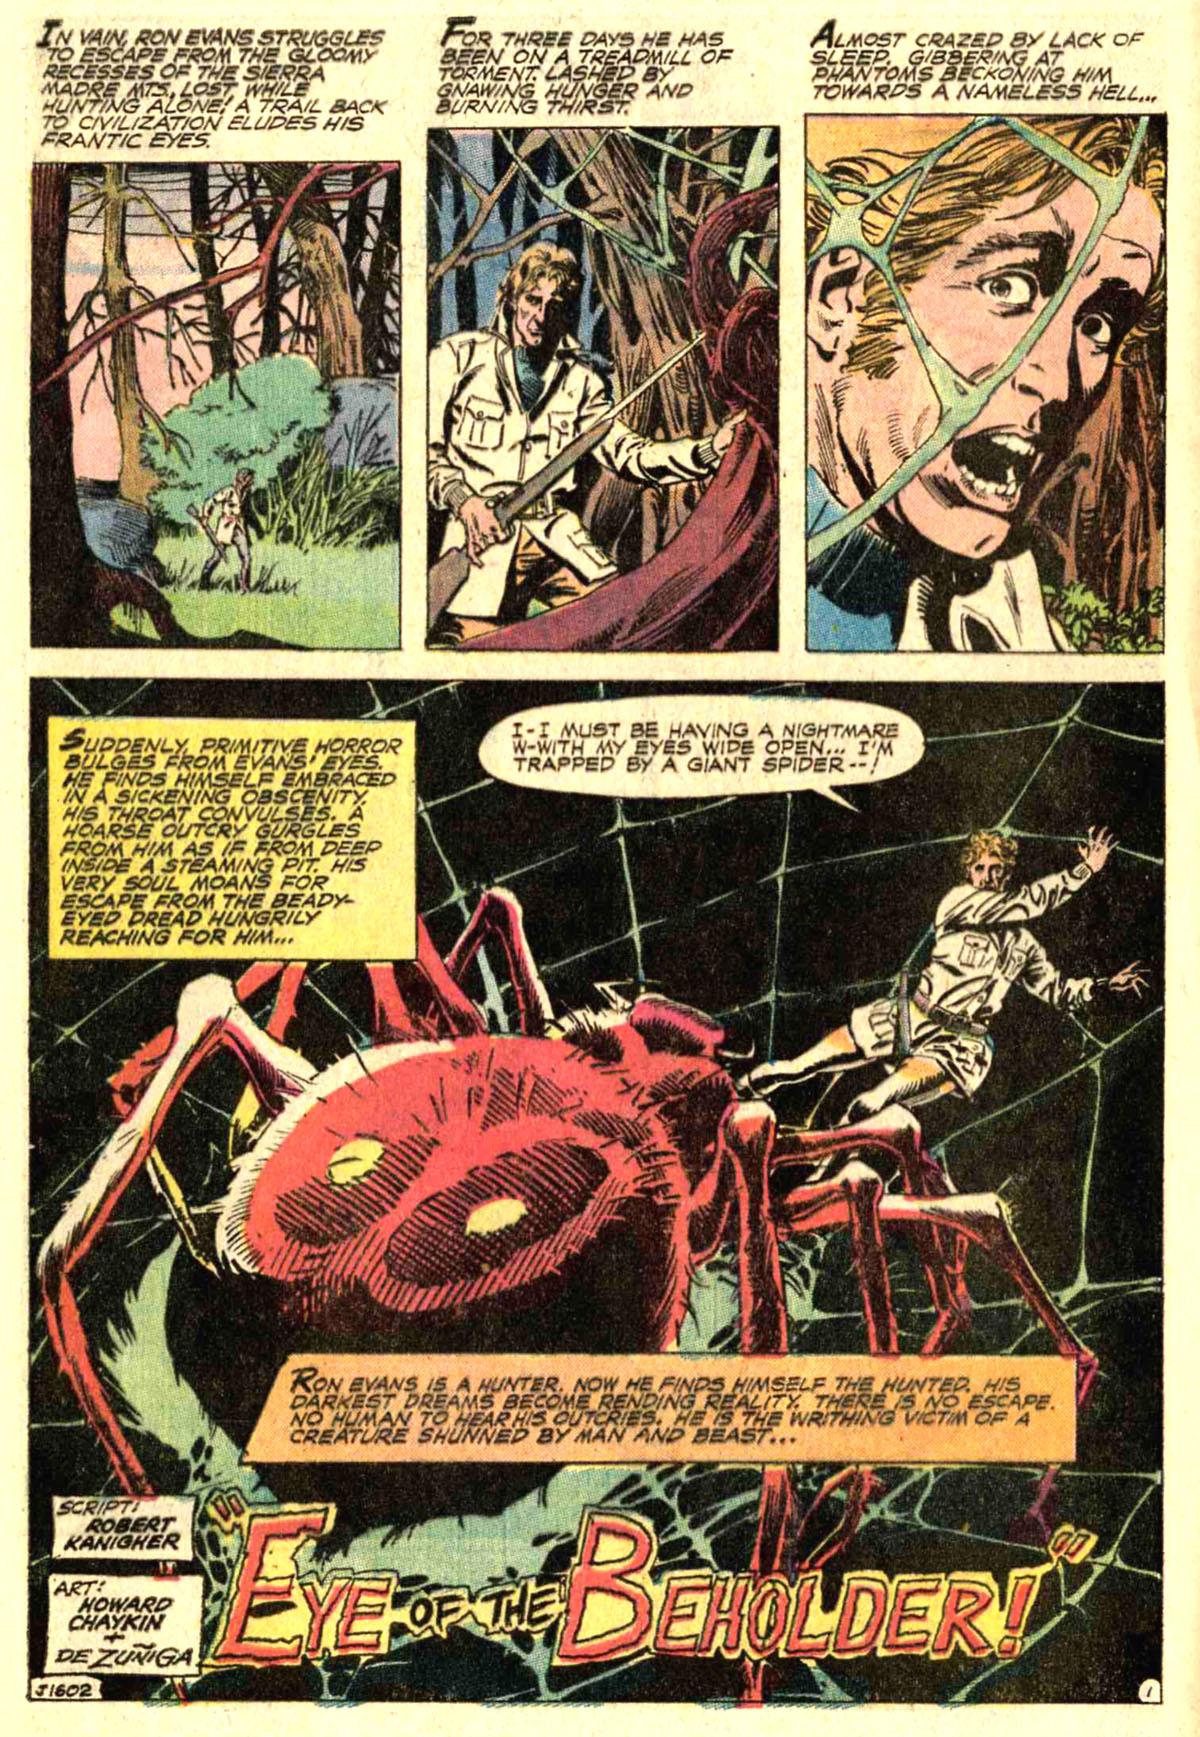 Forbidden Tales of Dark Mansion (1972) #7 pg1, penciled by Howard Chaykin & inked by Tony DeZuniga.